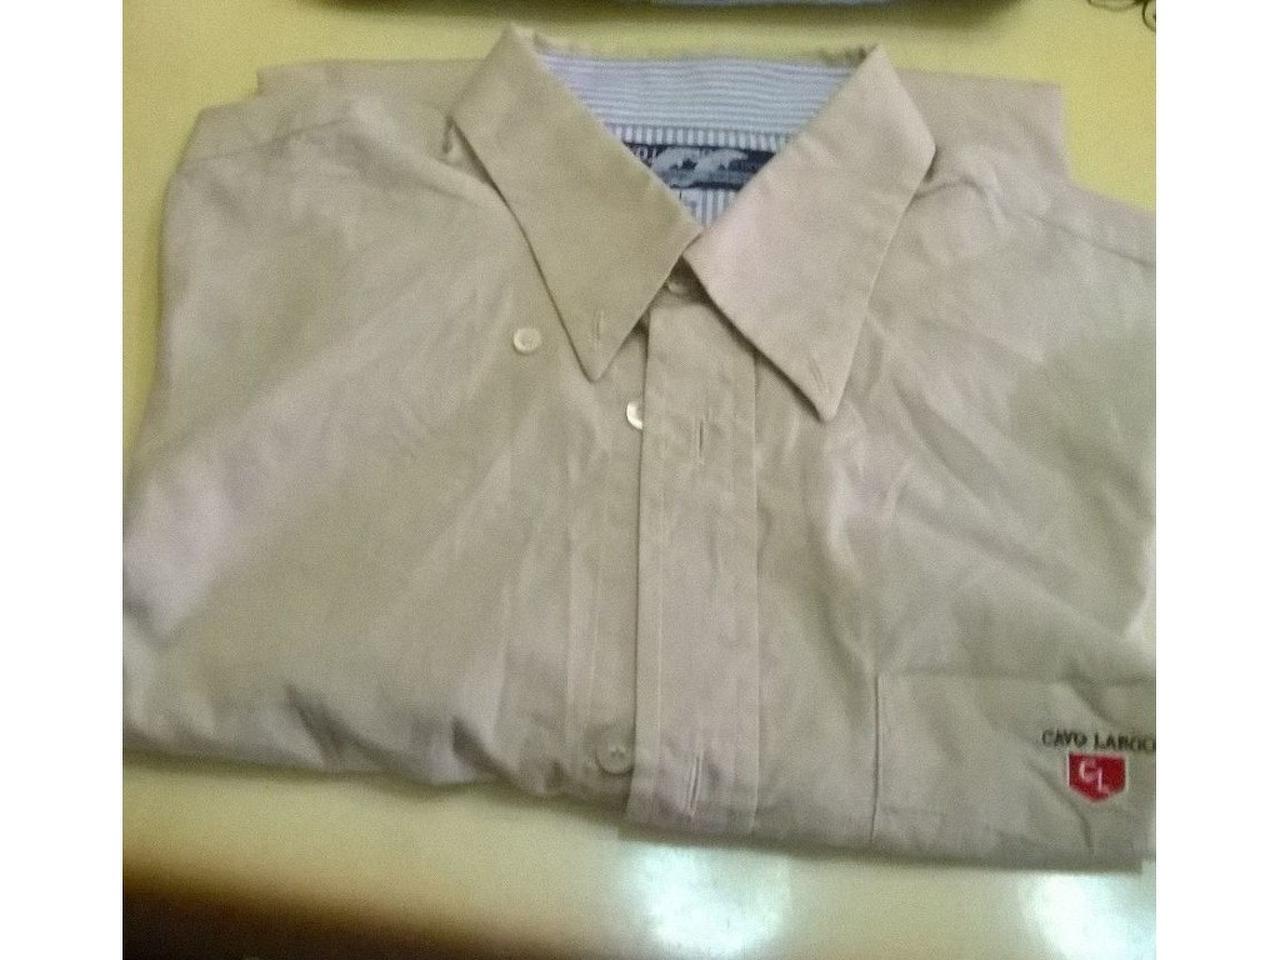 Camisas Barred's, G.Coast, C.Jeans, Cayo Largo, LOGG, N.Corrêa, etc - 3/8